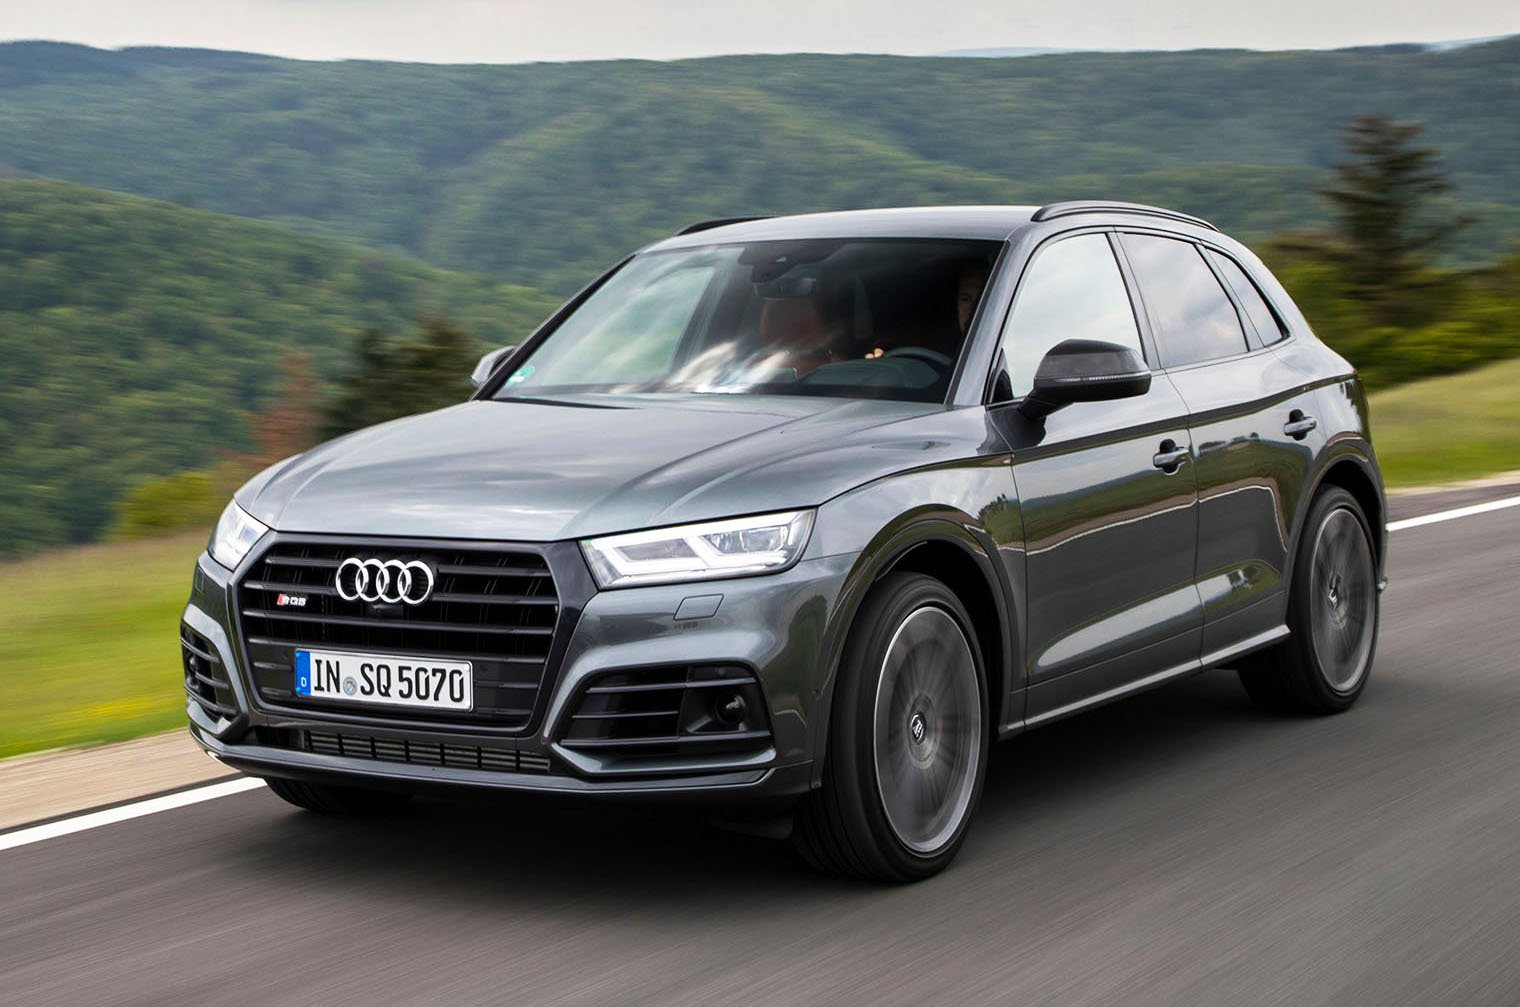 2019 Audi SQ5 front - grey